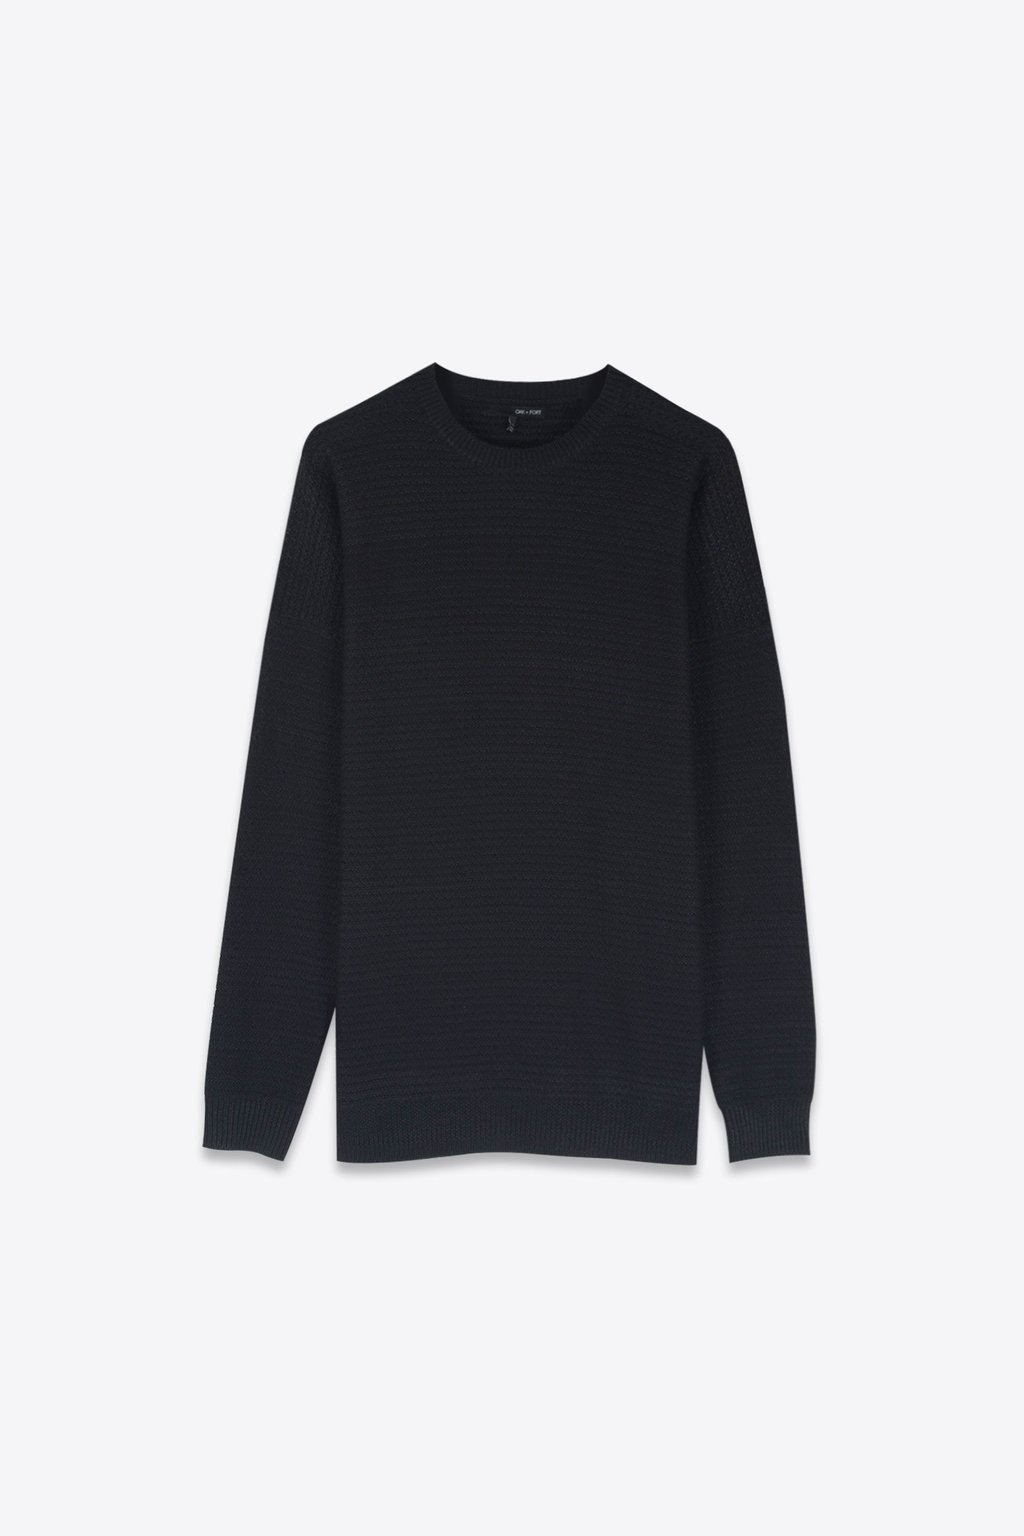 Sweater 1135 Black 6